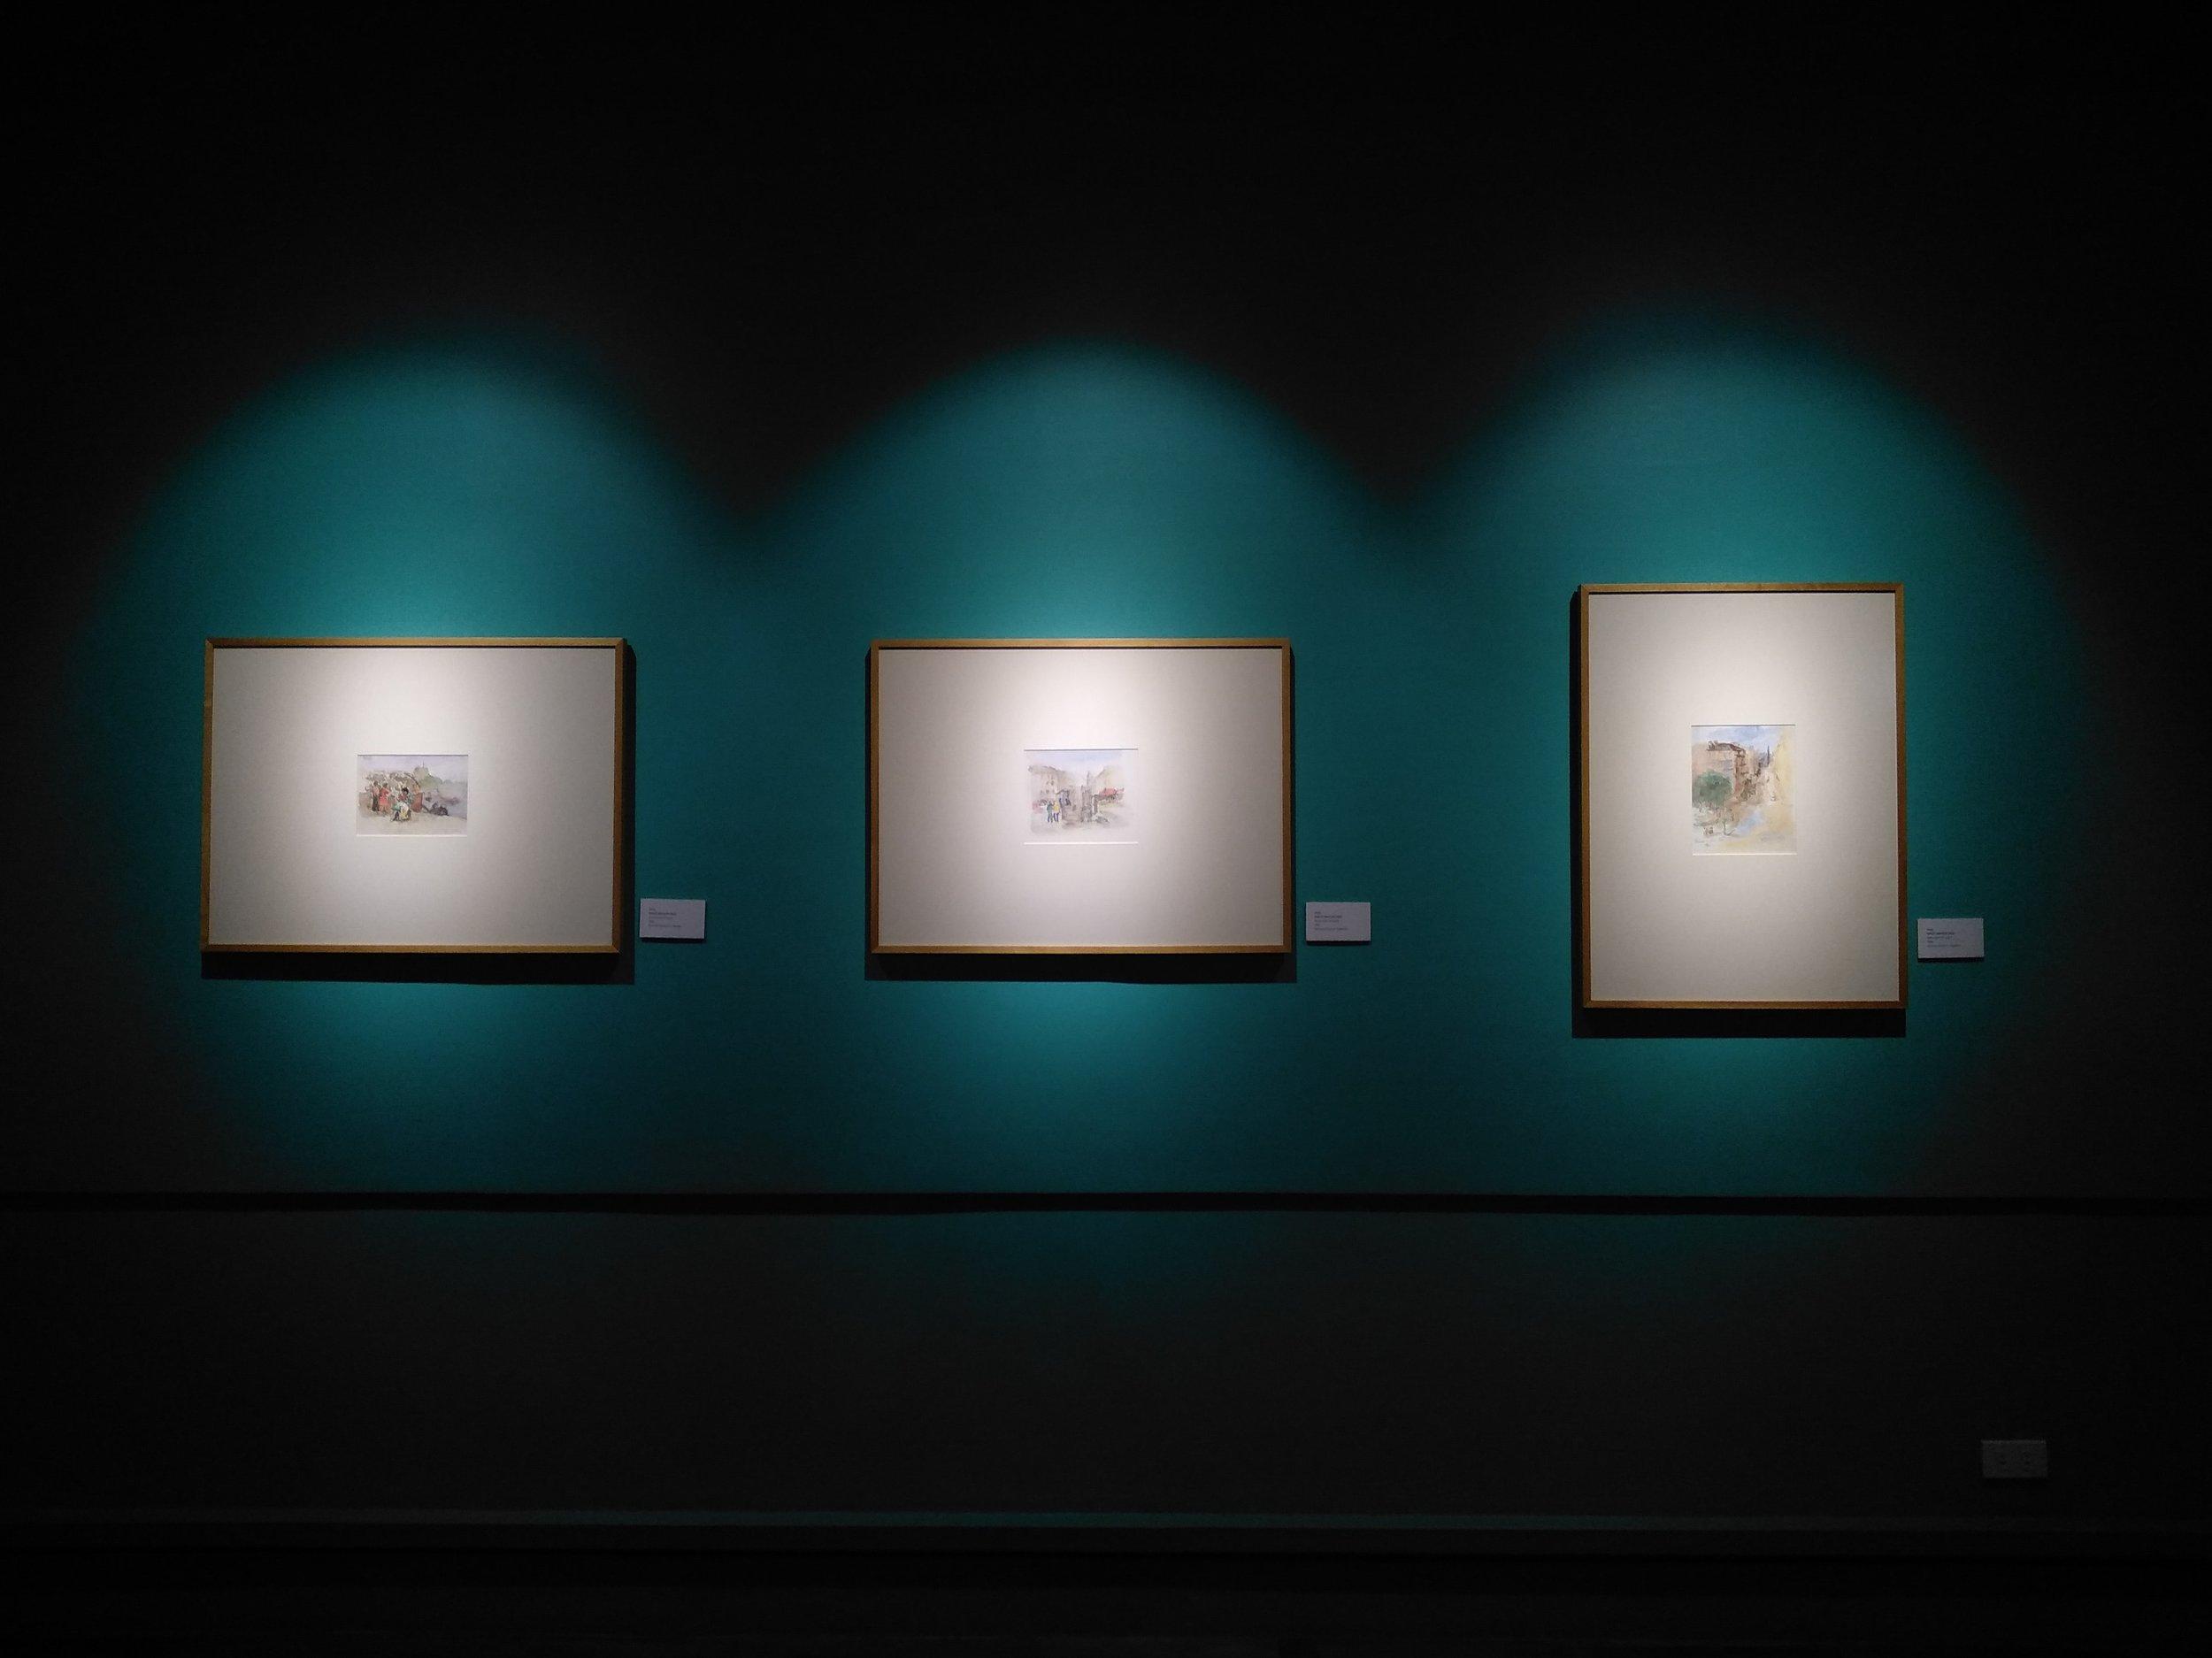 art-art-exhibition-art-gallery-1674049.jpg